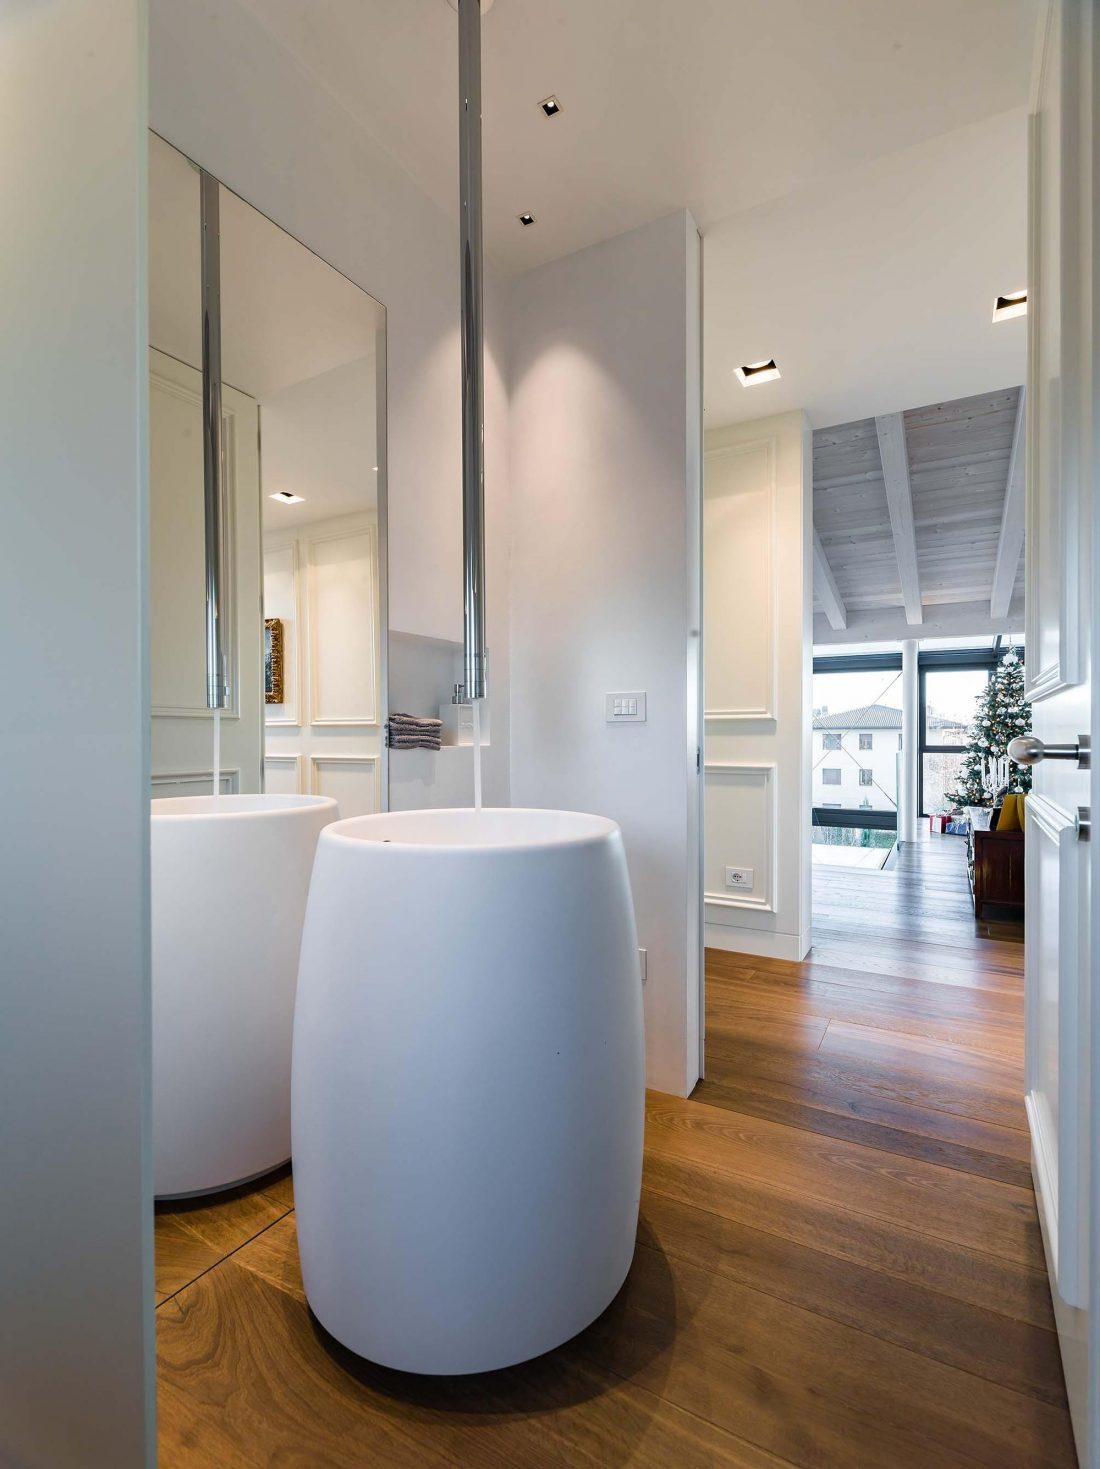 Дом в Порденоне, Италия, от студии Caprioglio Associati Architects 18